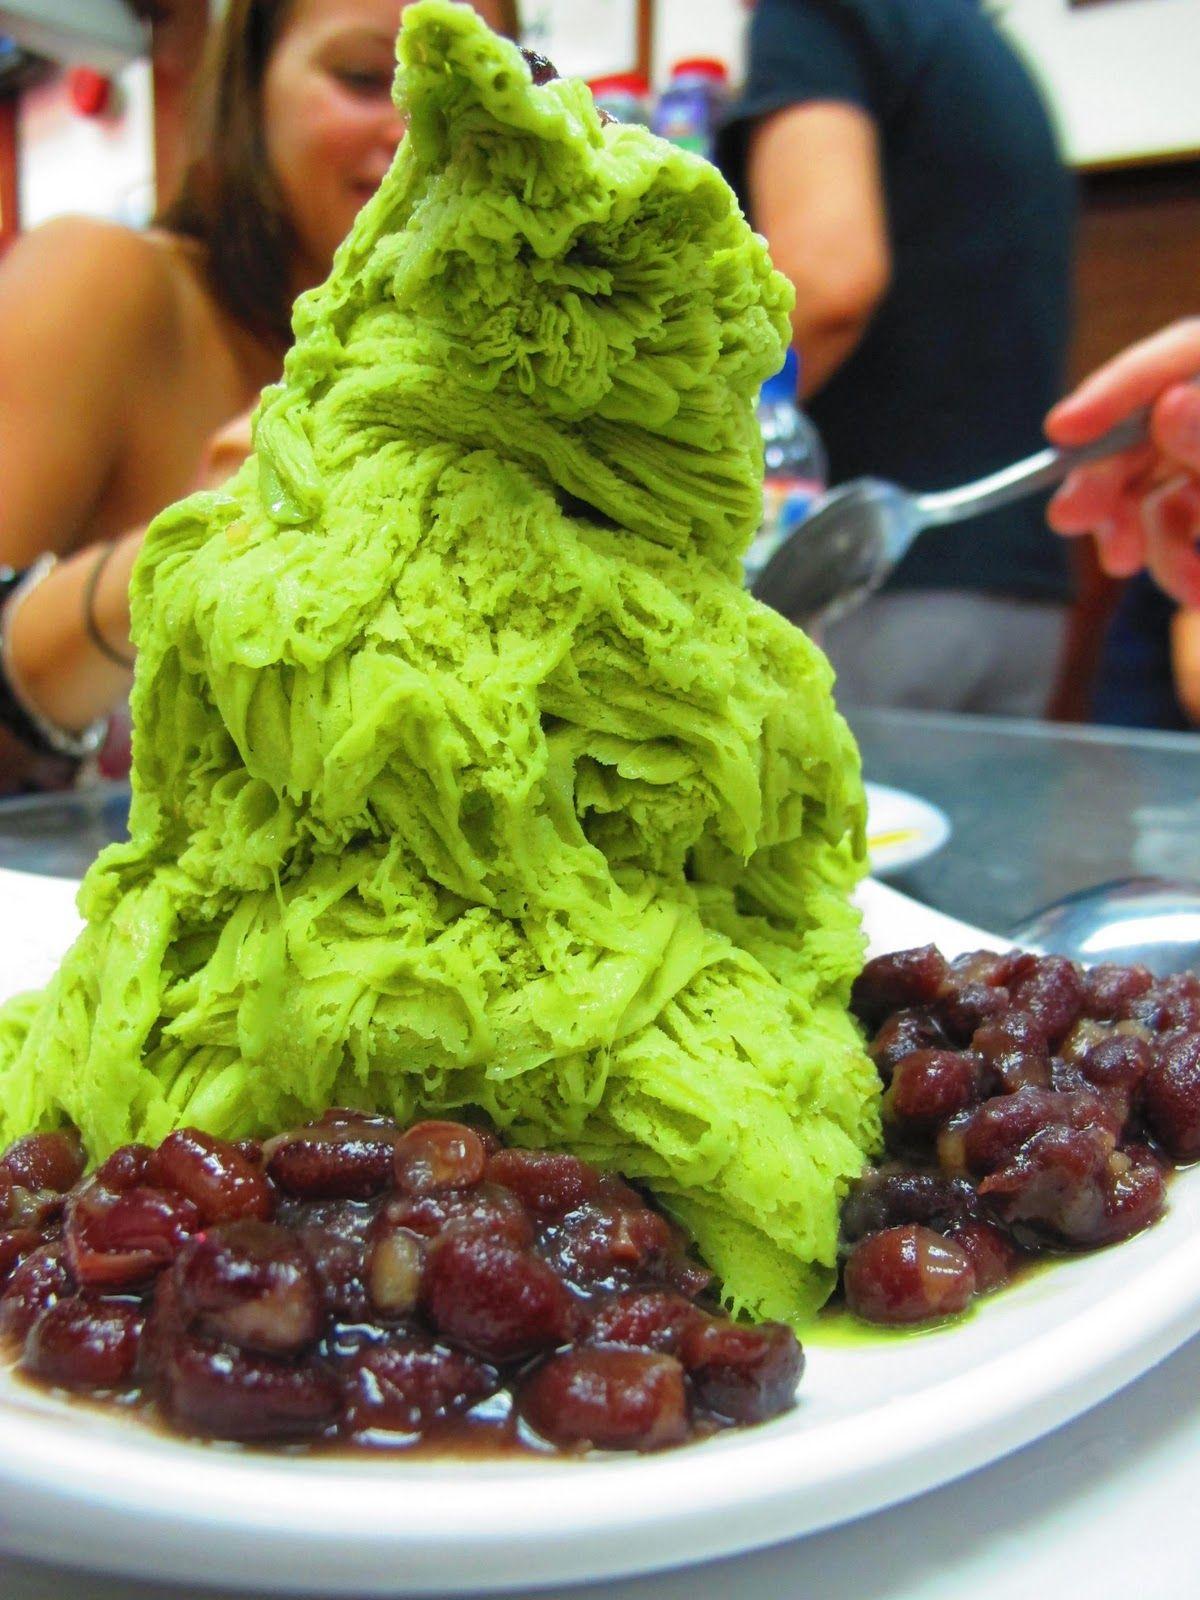 Green Tea Ais Kacang (snow ice, shaven ice dessert). Mei